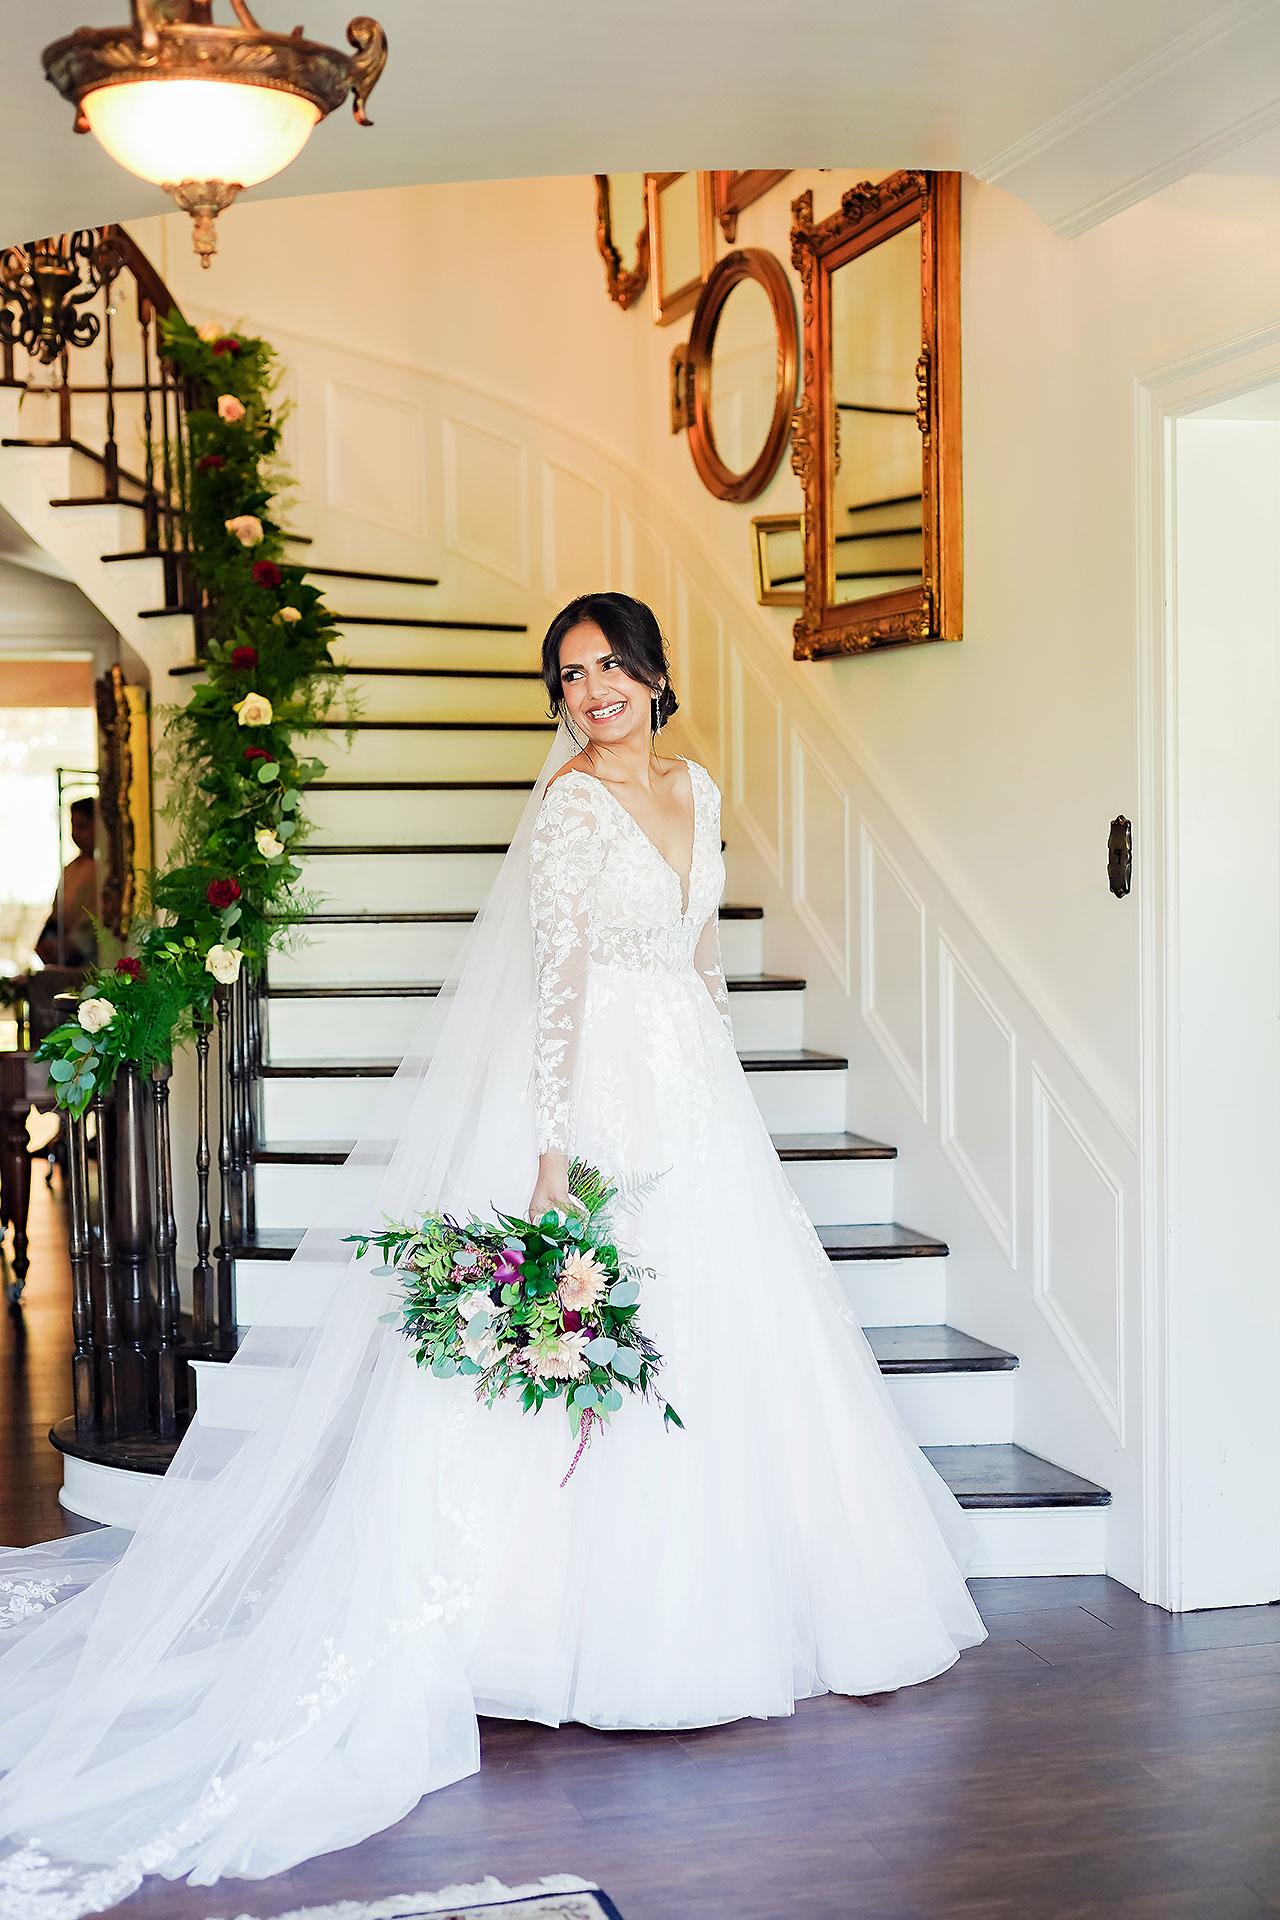 Nadia Parker Black Iris Estate Carmel Indiana Wedding May 2021 133